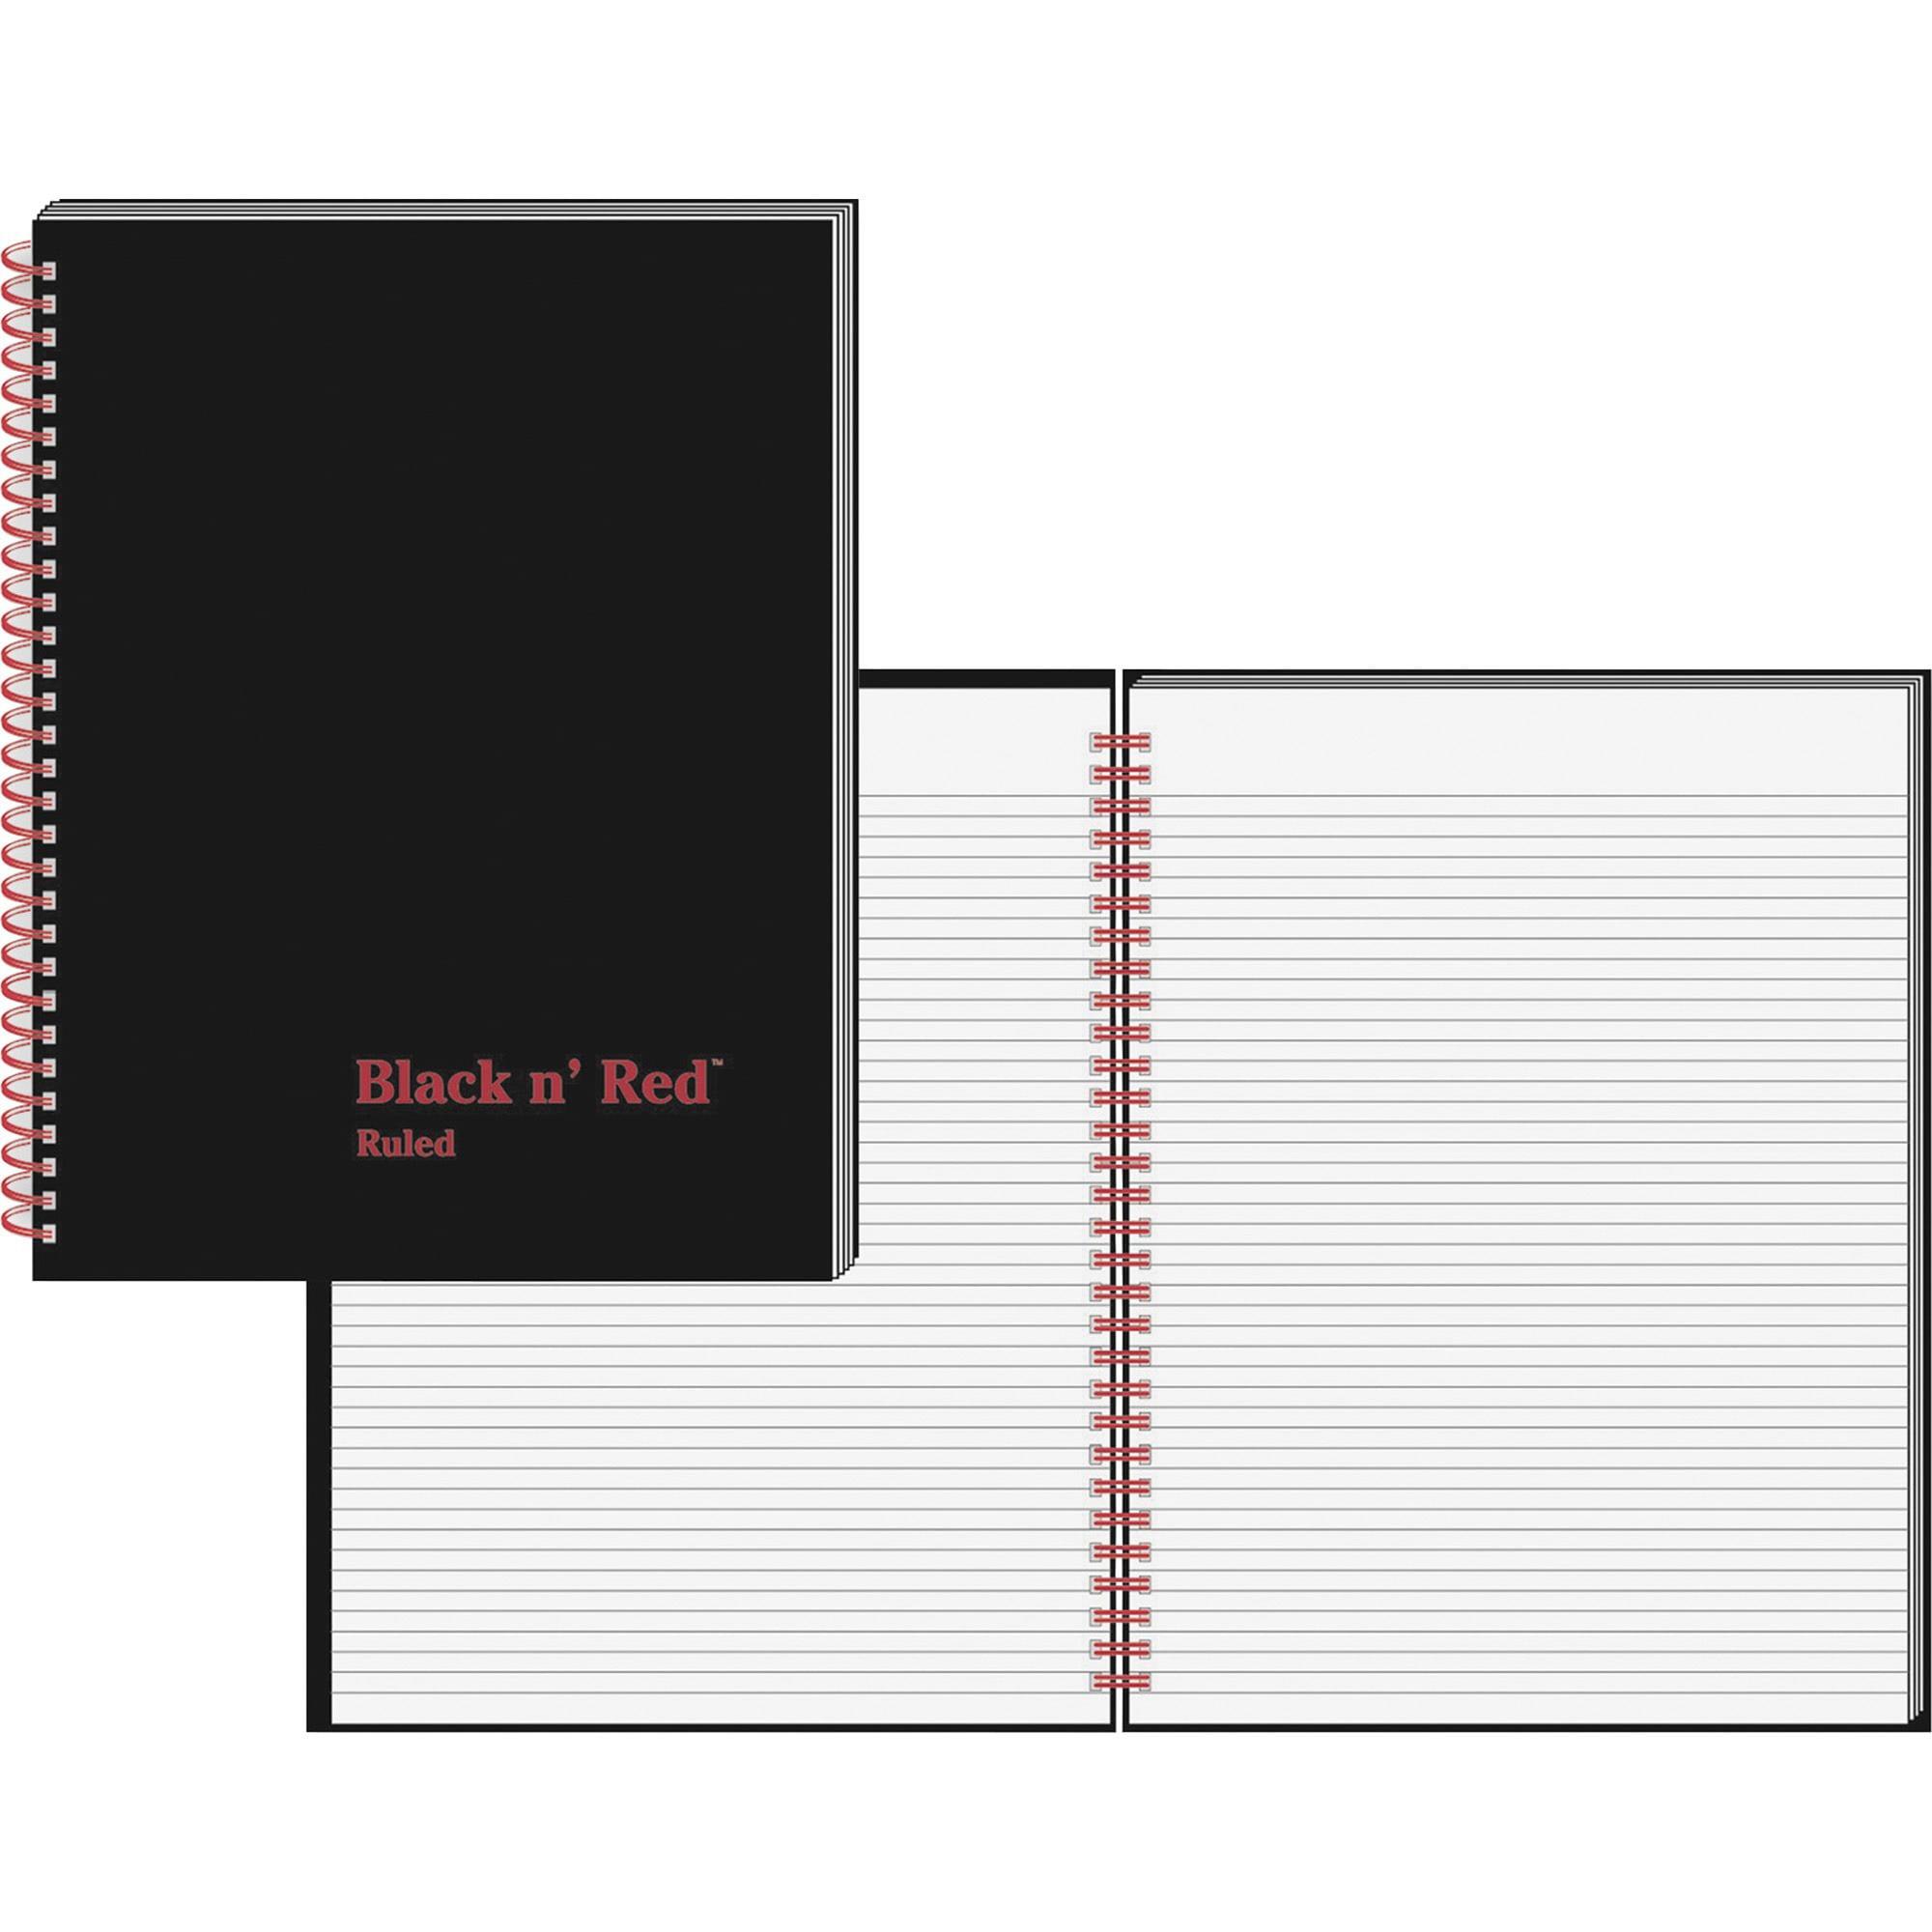 Black n' Red, JDKK67030, Ruled/ Perf. Wirebound Notebook - Letter, 1 Each